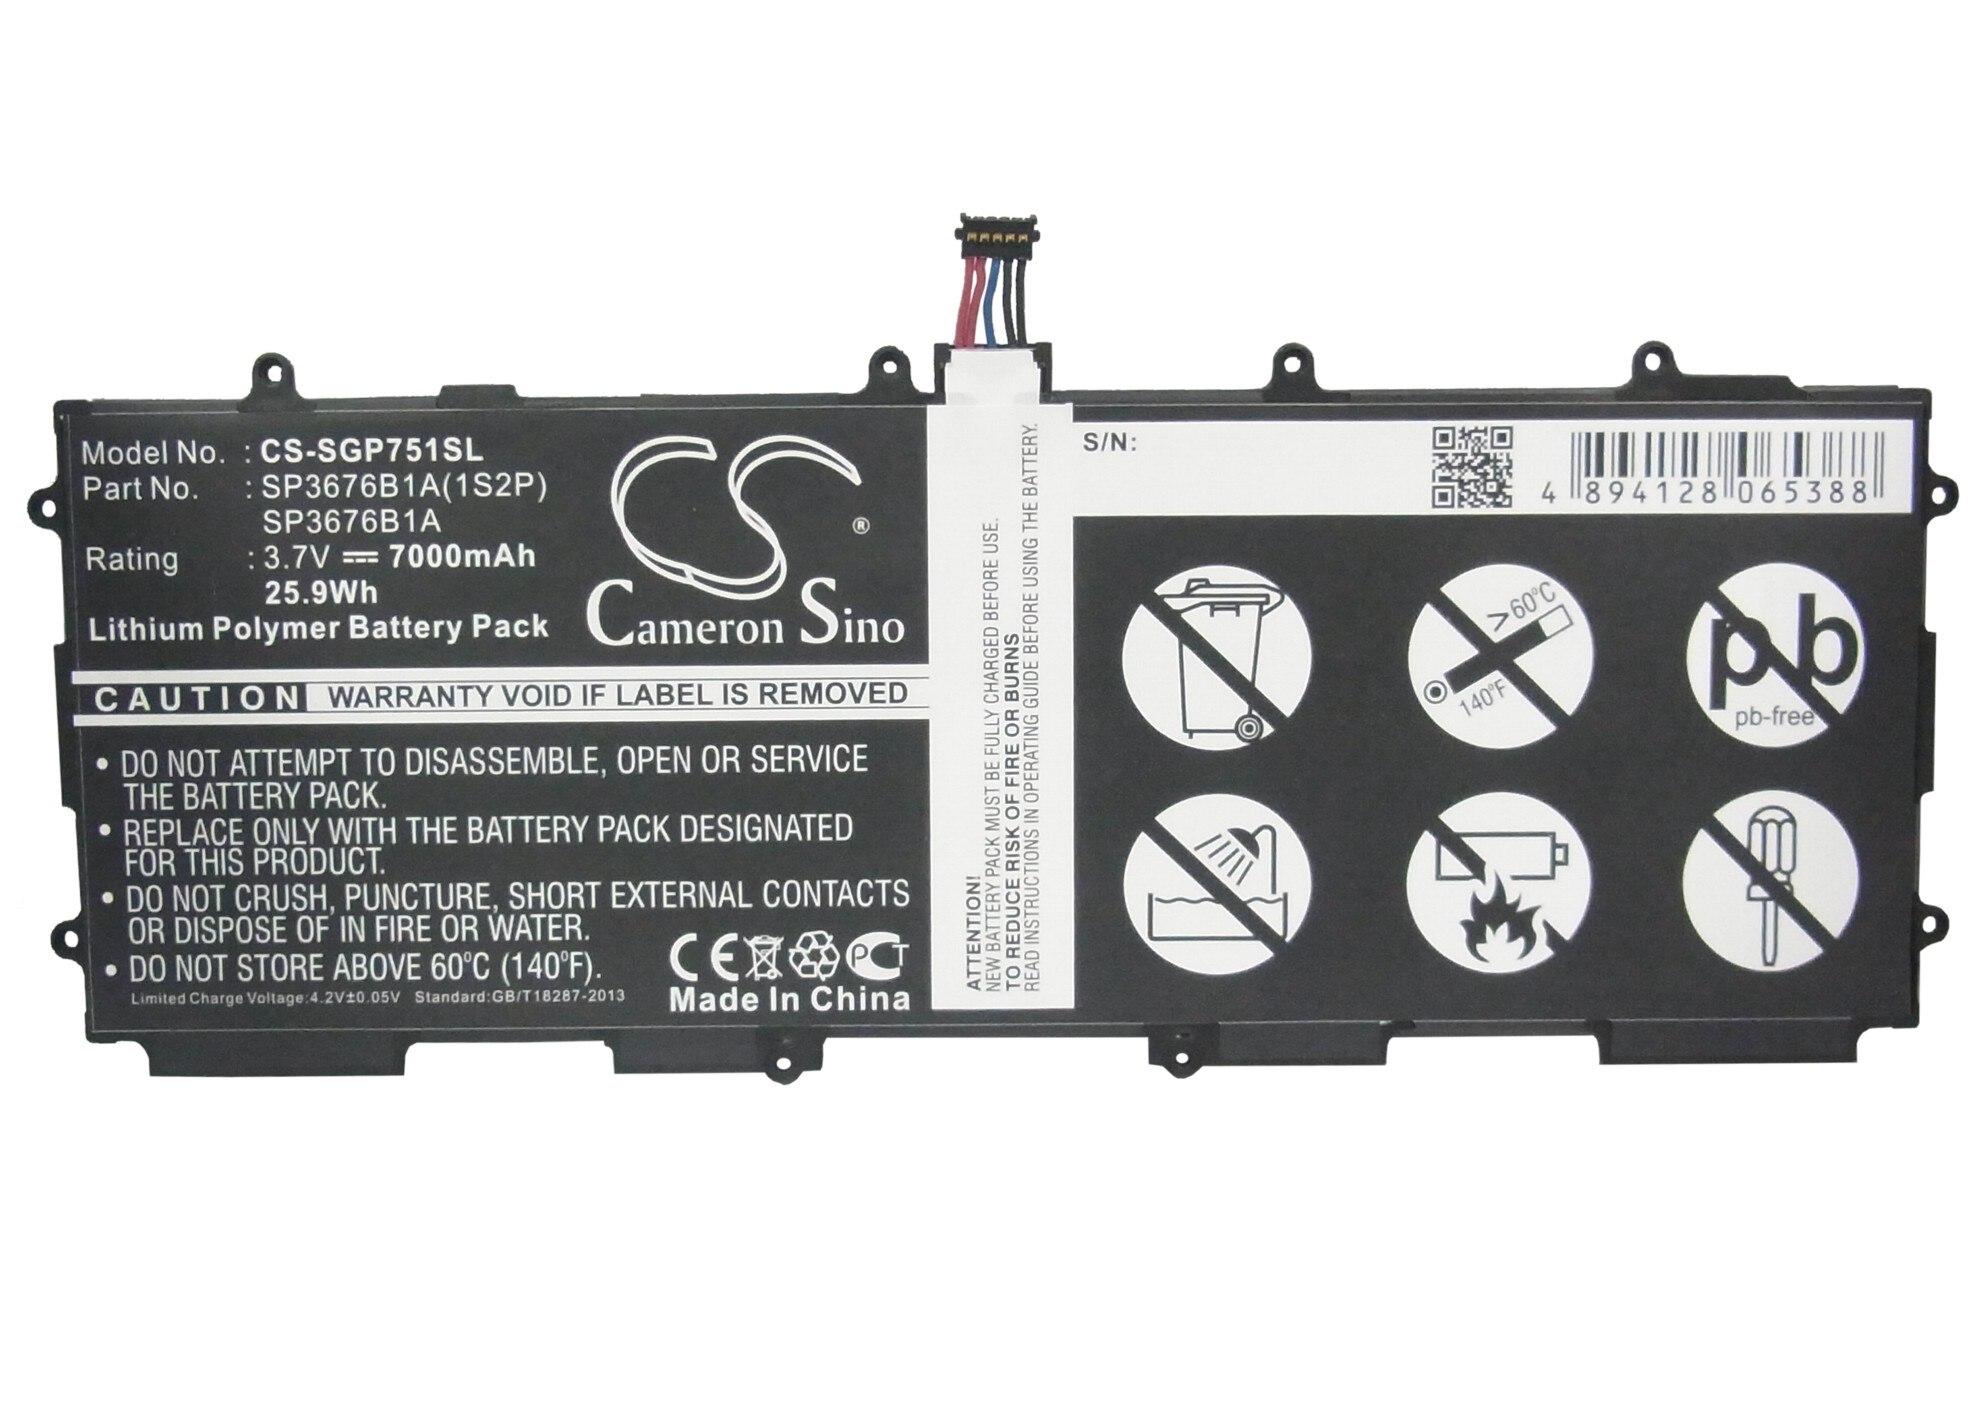 N8010 P5113 Sch-i915 Sgh-i497 Senility VerzöGern N8013 P5100 P5110 P7510 N8000 Gut Ausgebildete Cameron Sino 7000 Mah Batterie Sp3676b1a Für Samsung Gt-7511